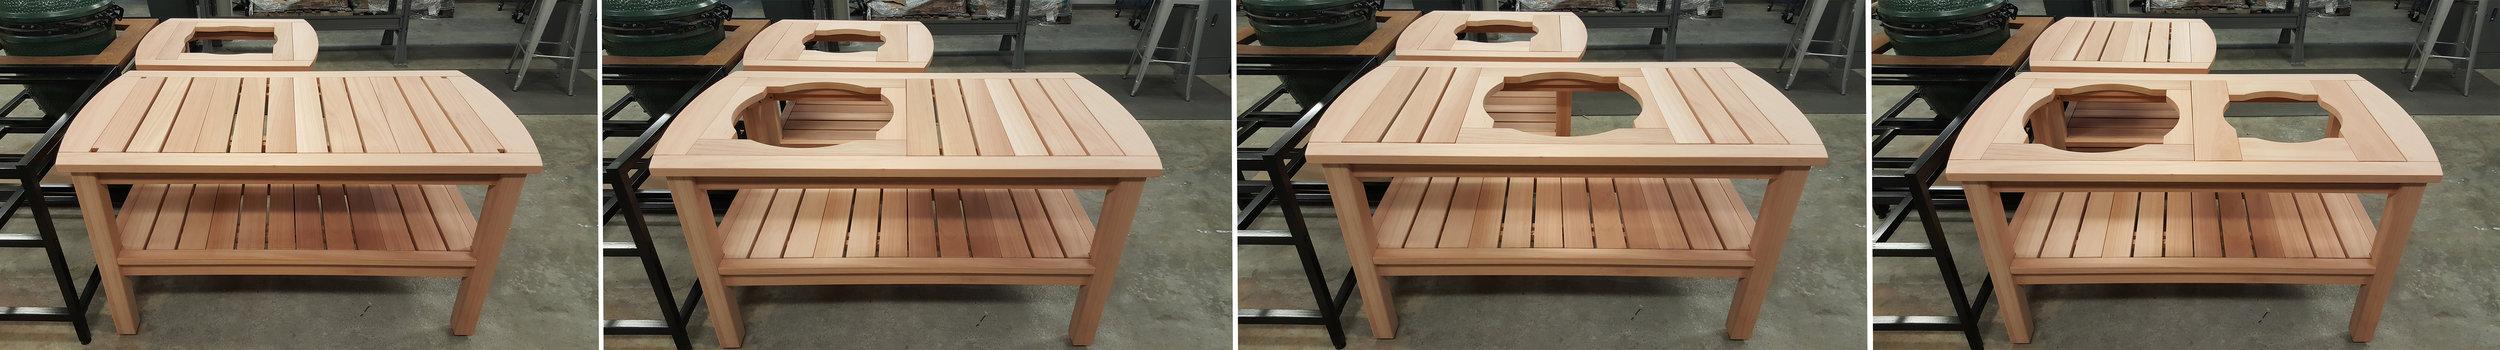 modular wood inserts sequence.jpg